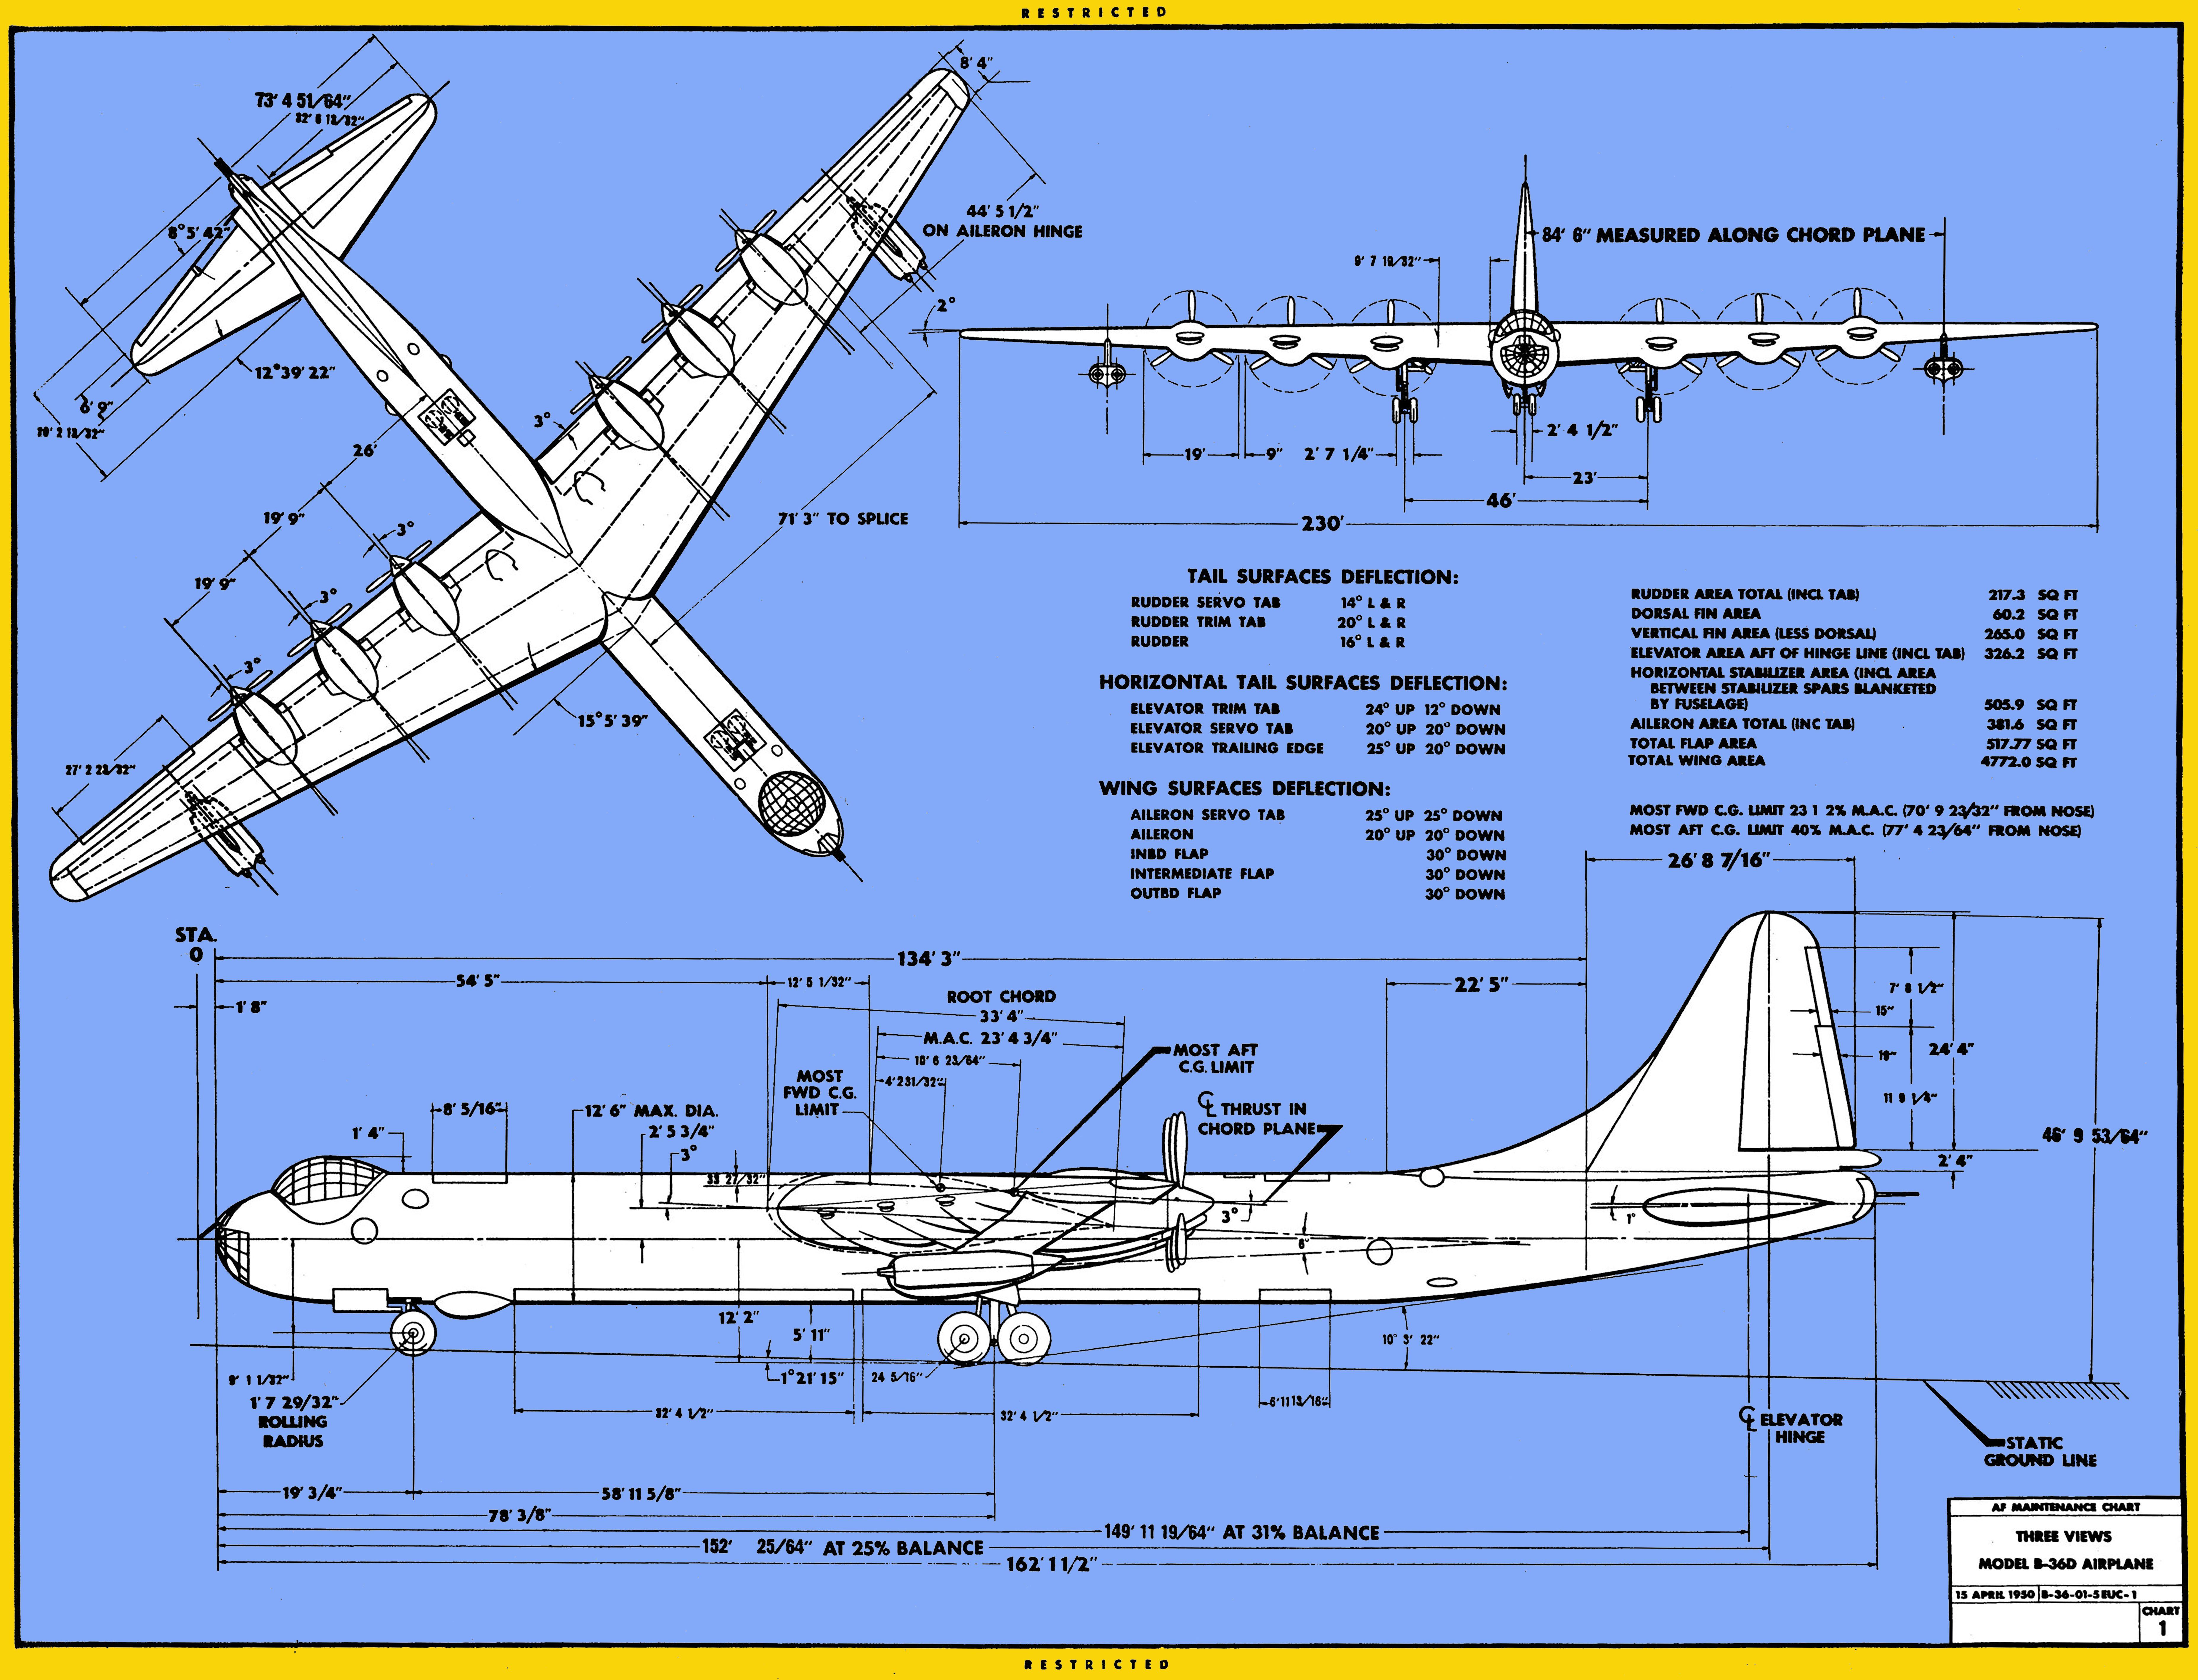 b-36-schematic-blueprint-style-yellow-border-compressor.jpg